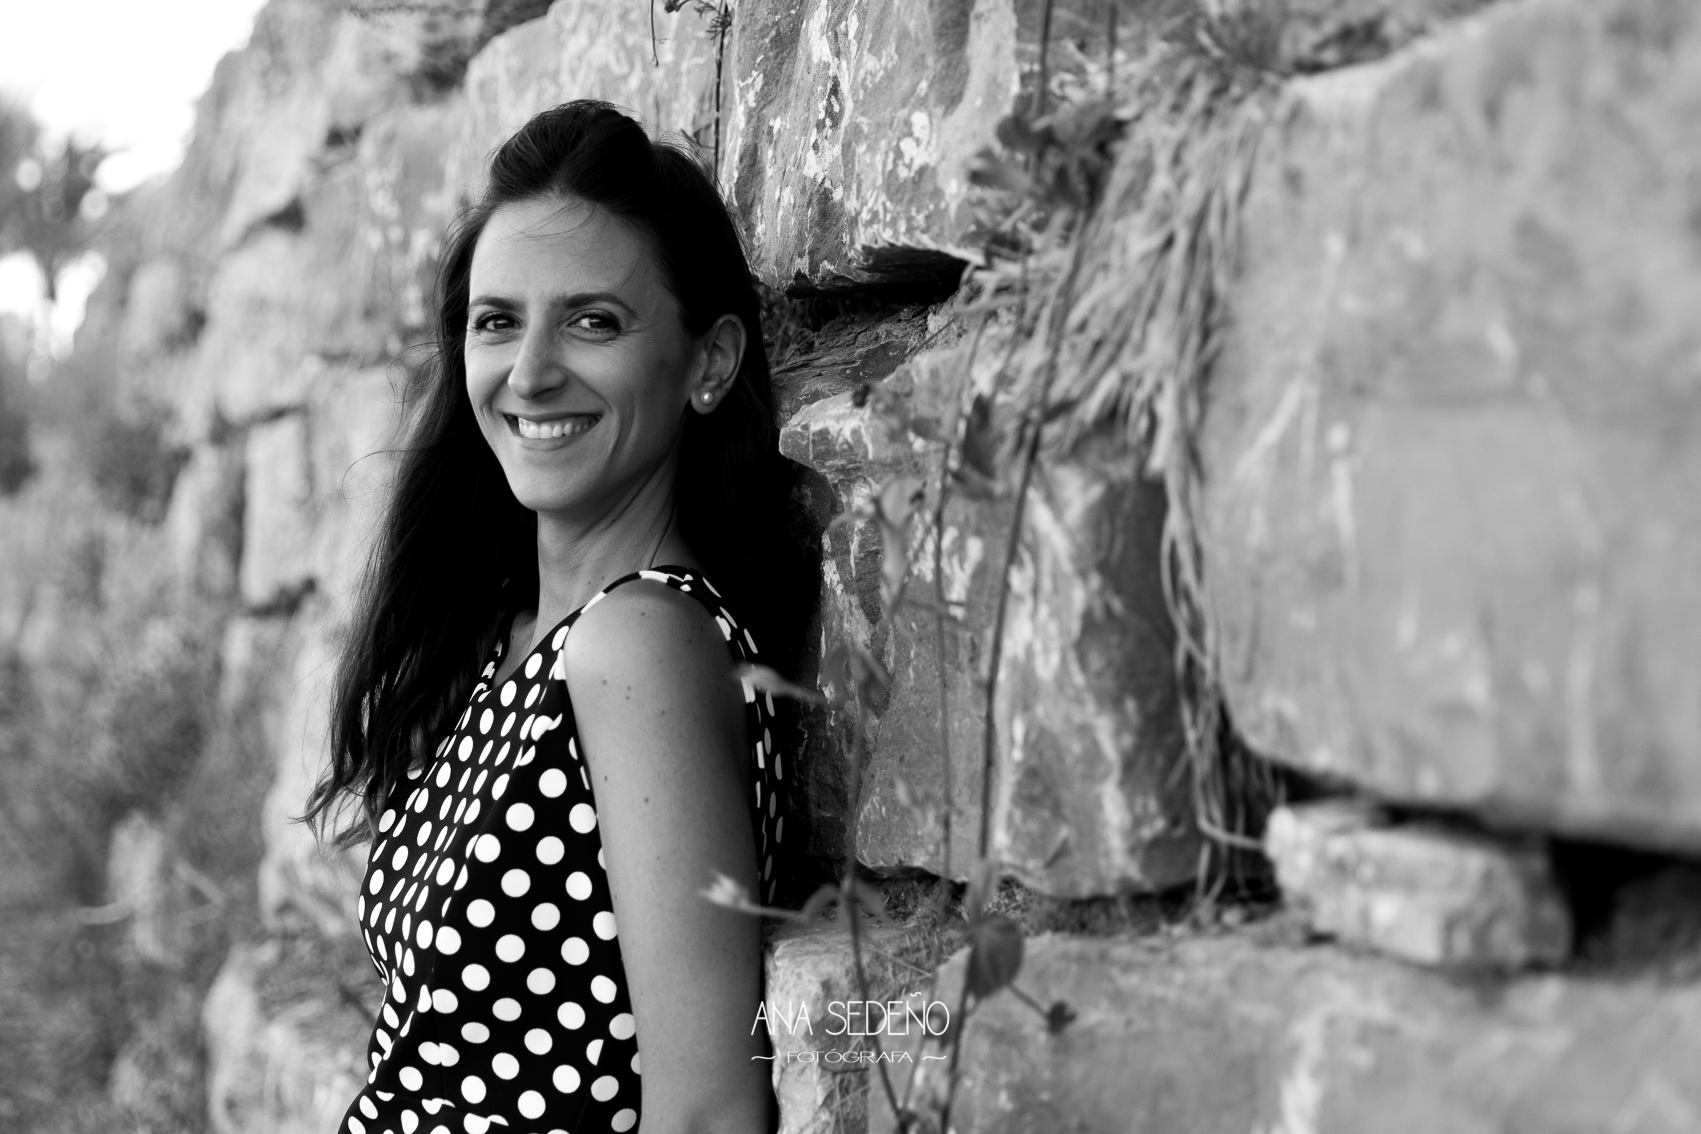 Ana Sedeño Fotografa.-PreBJ & L-0132